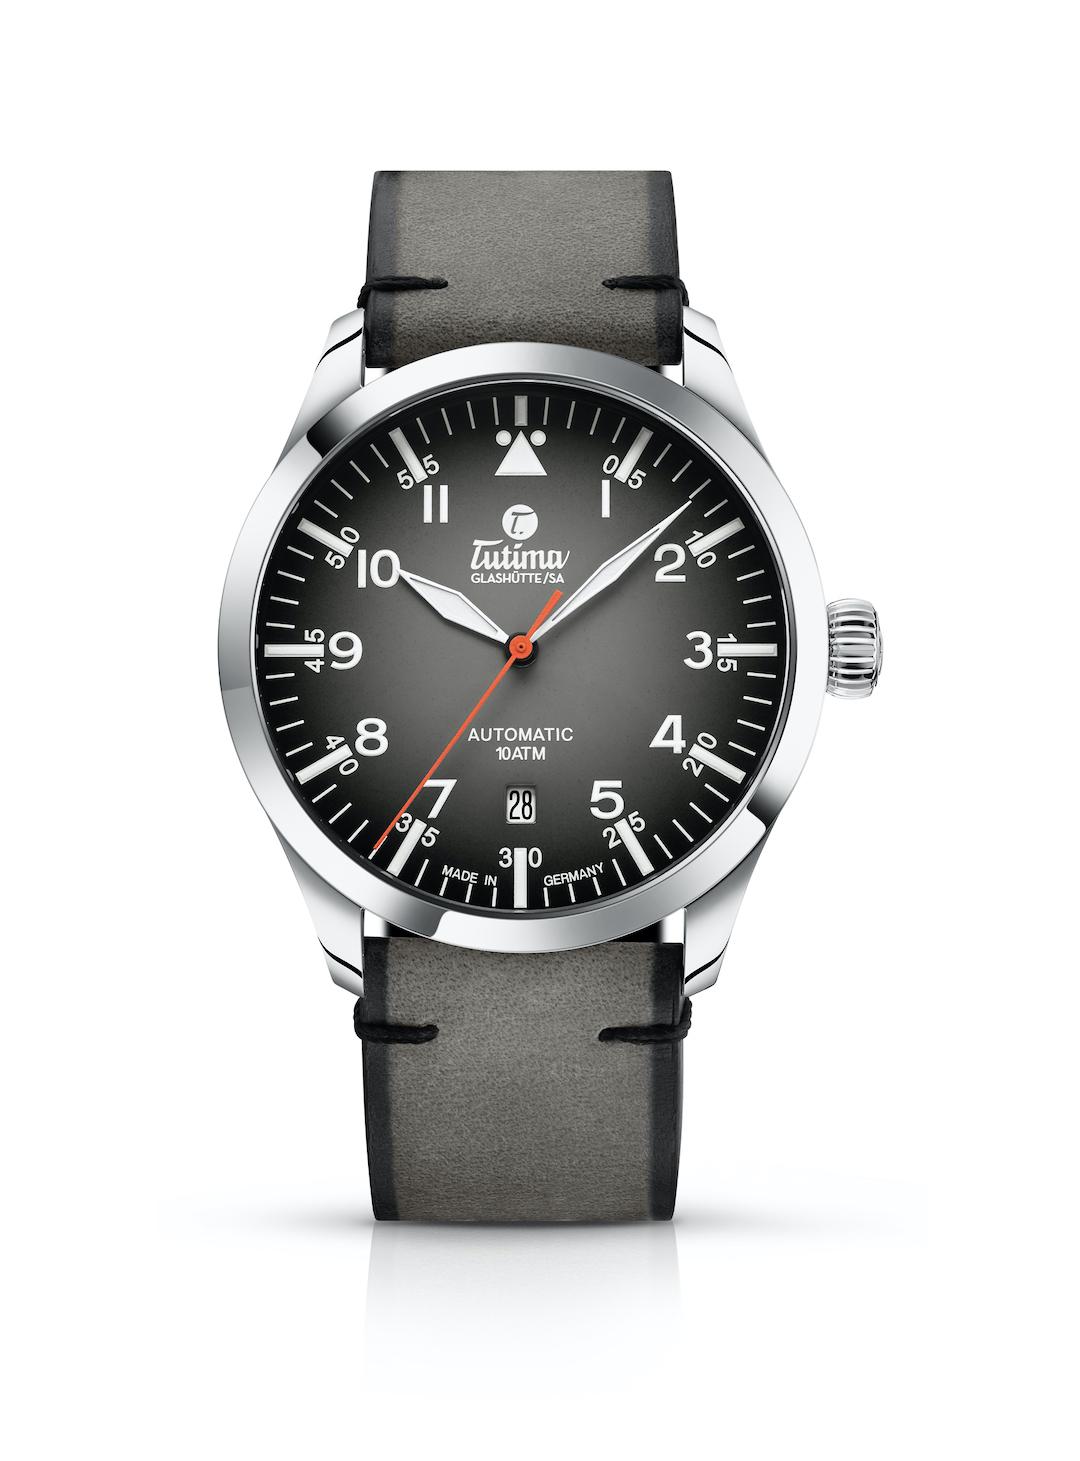 Tutima Flieger Slate Grey pilot watch